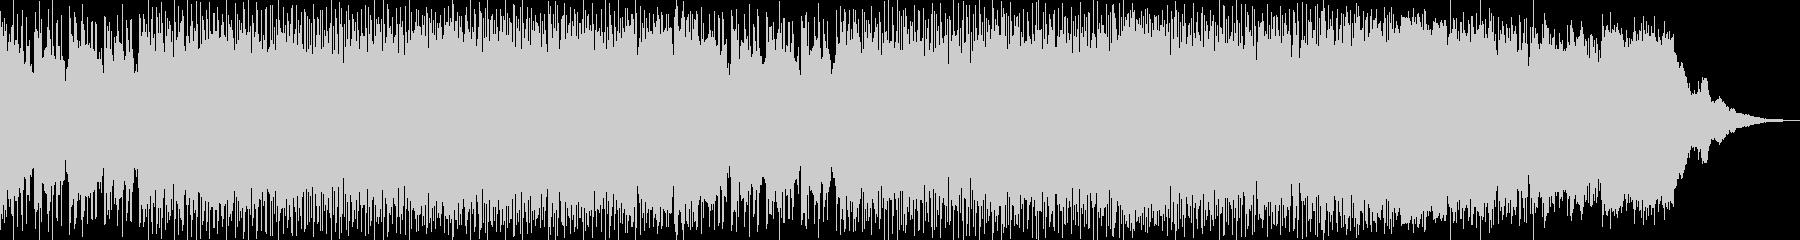 YOUTUBE/動画に使えるBGMの未再生の波形